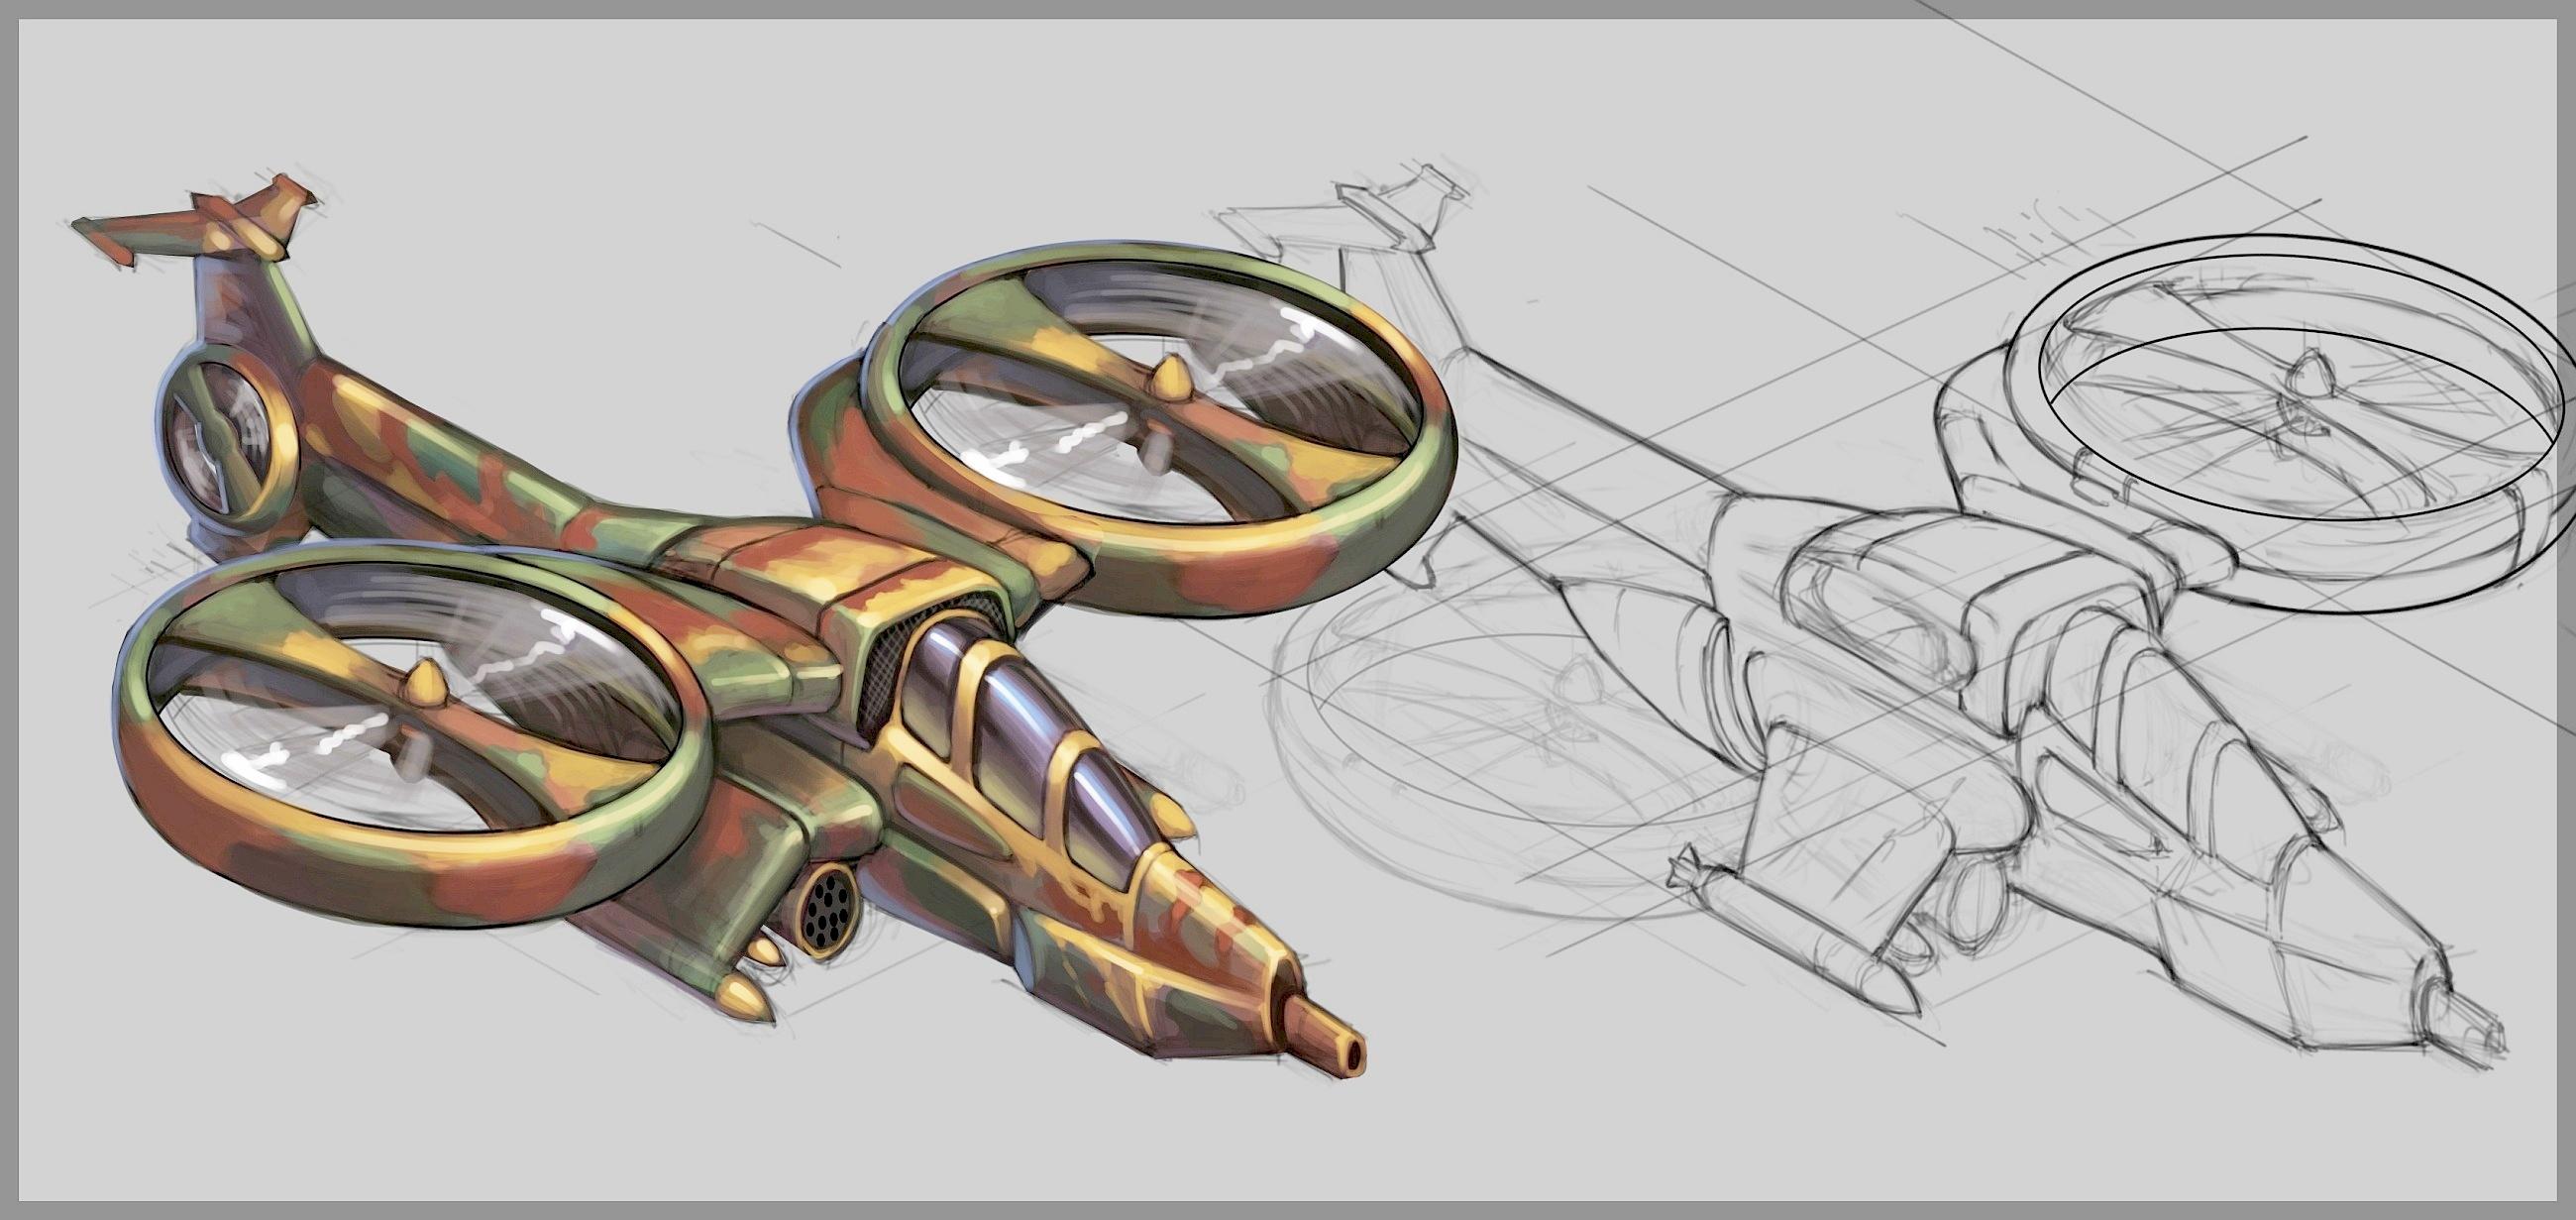 Вертолет Охотник — концепт-арт 2